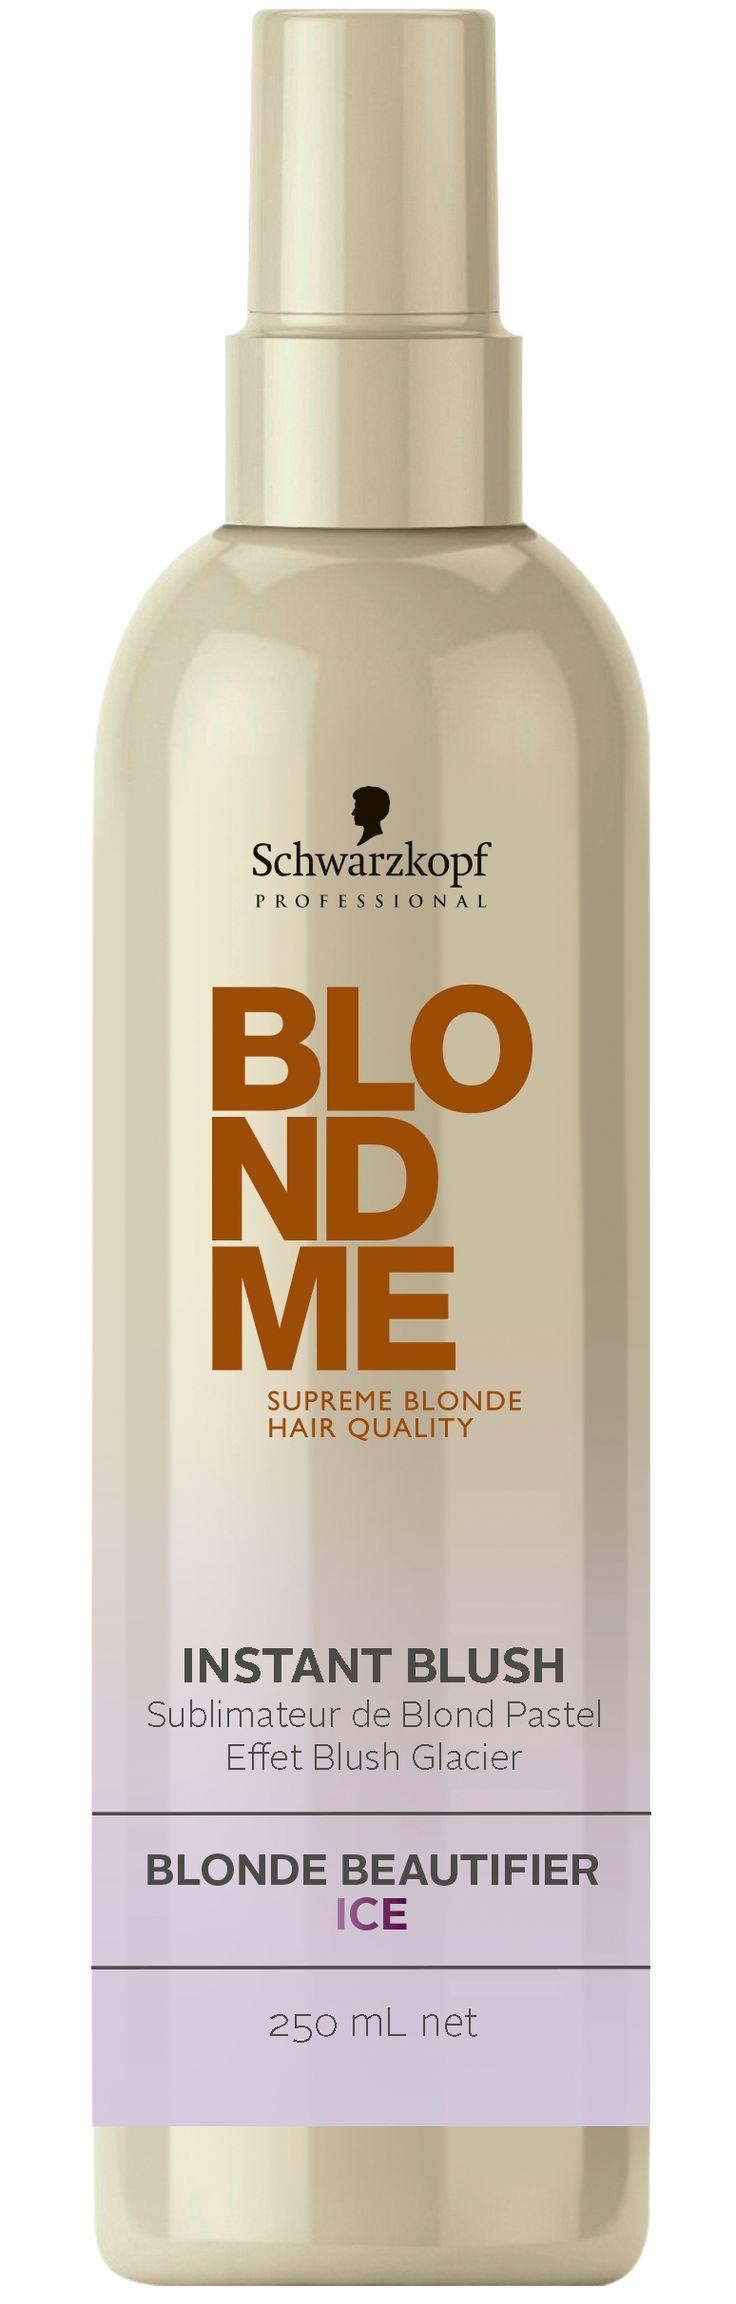 schwarzkopf professional blondme instant blush ice 250ml - Coloration Blond Me Schwarzkopf